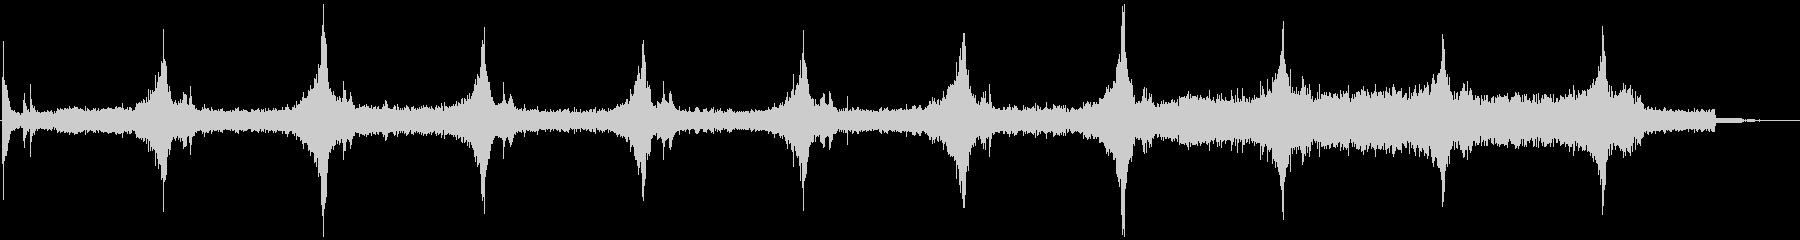 PADS ノイズオブファイア01の未再生の波形